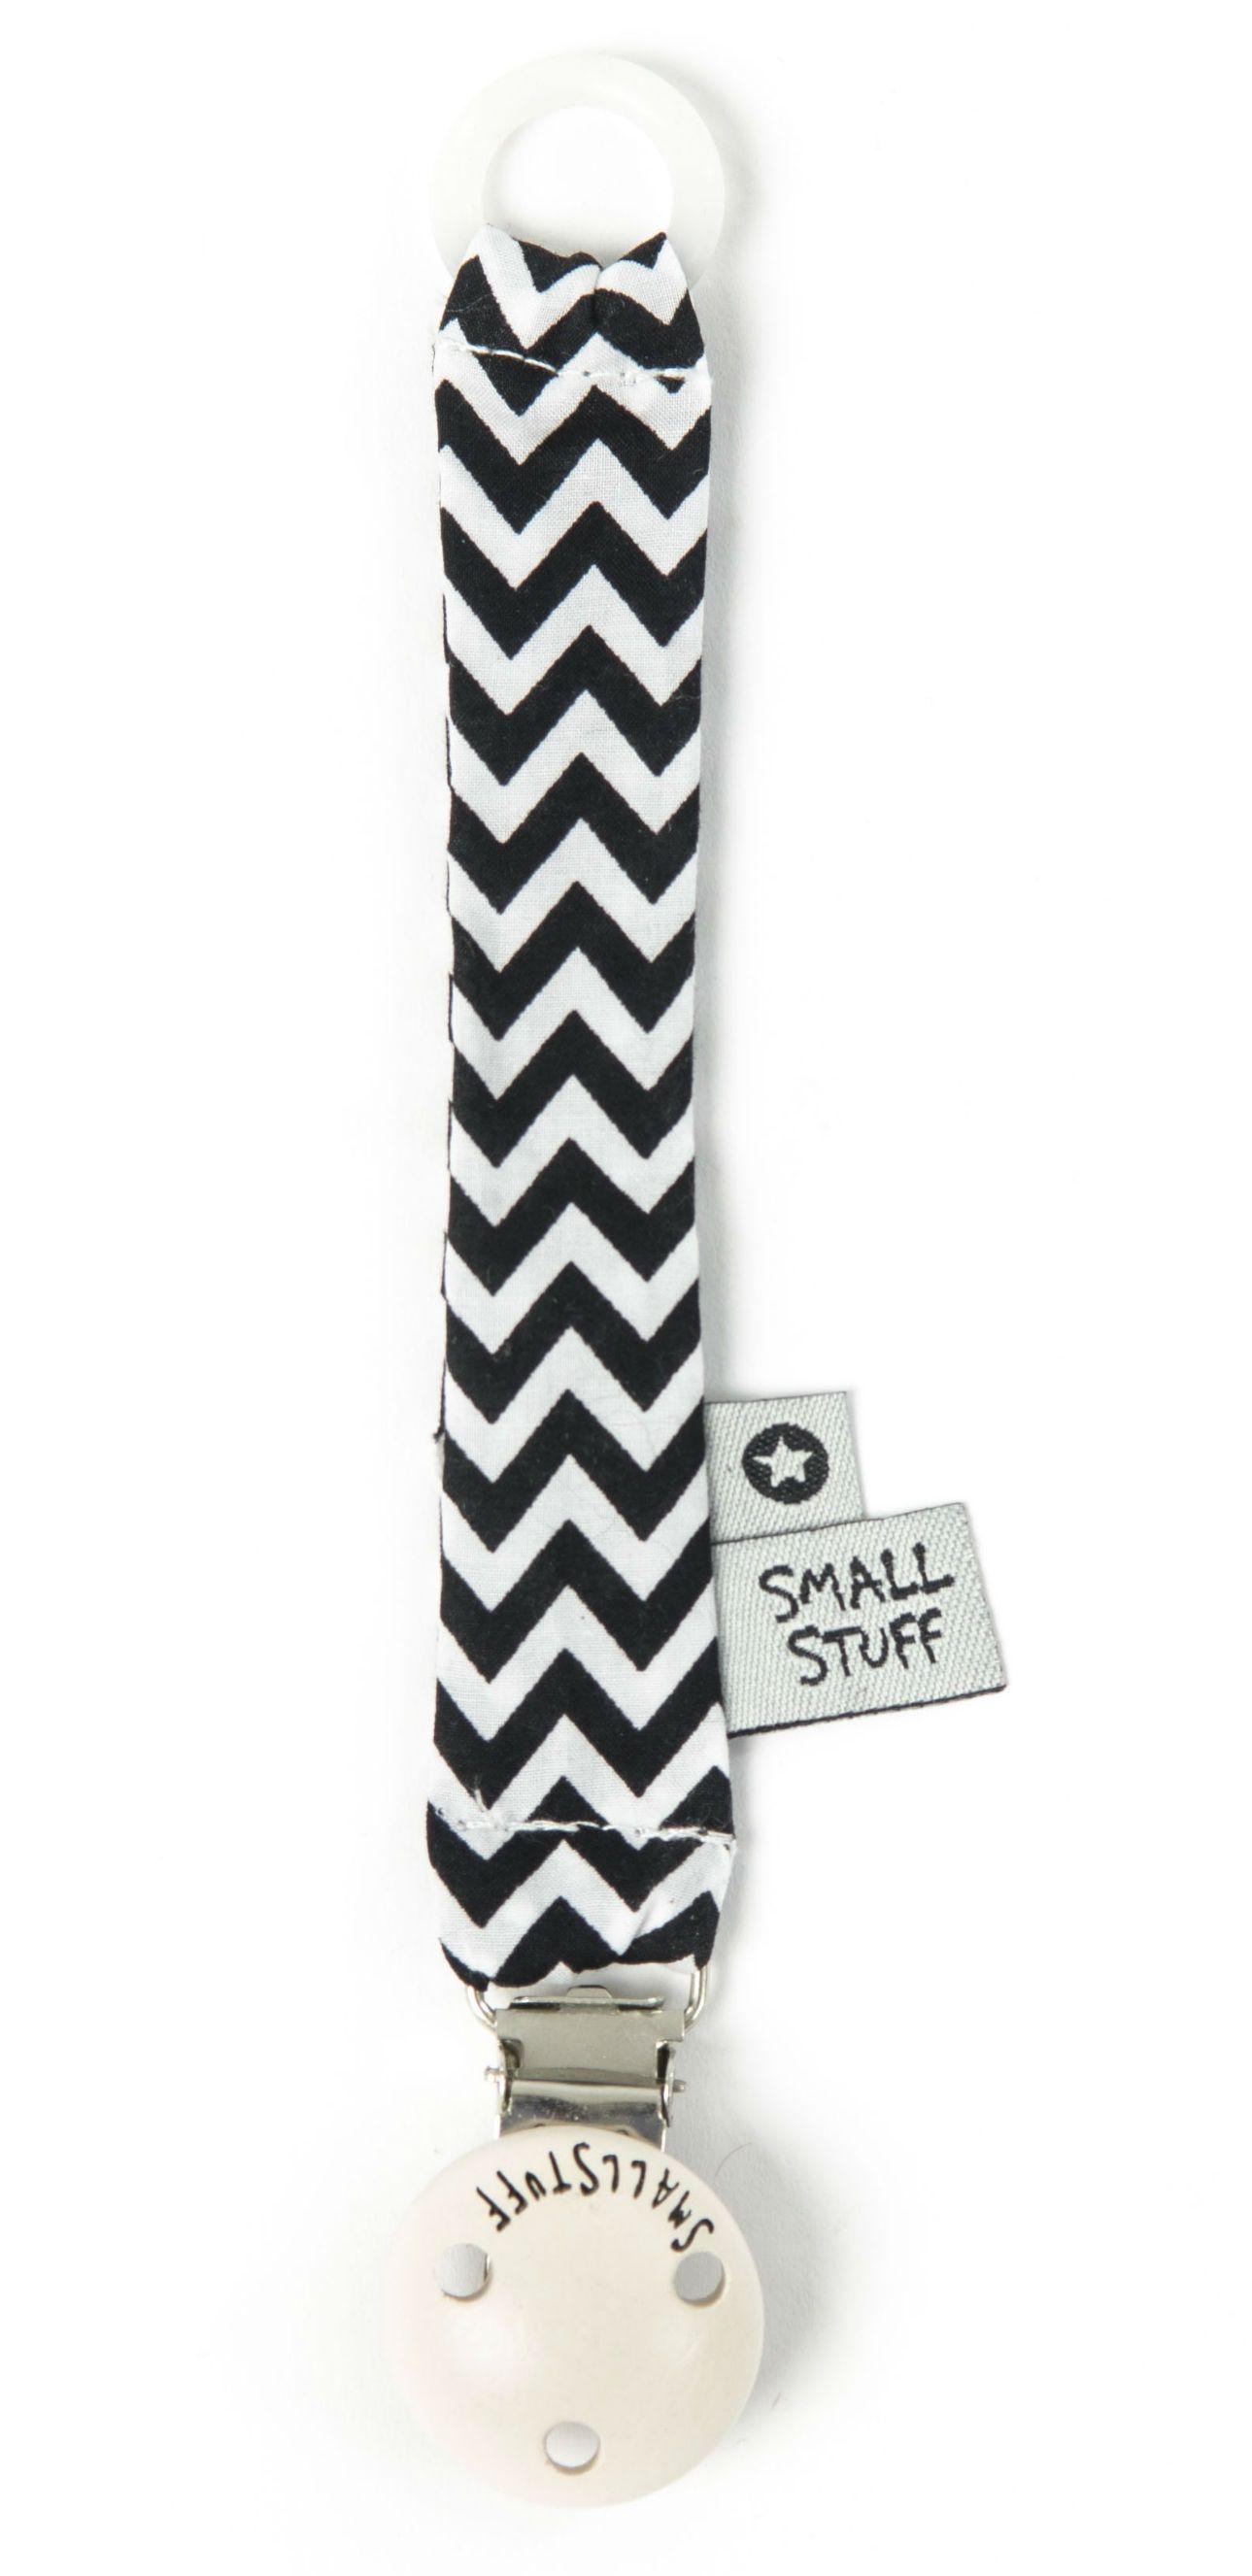 Image of   Suttekæde fra Smallstuff - Black/white zigzag